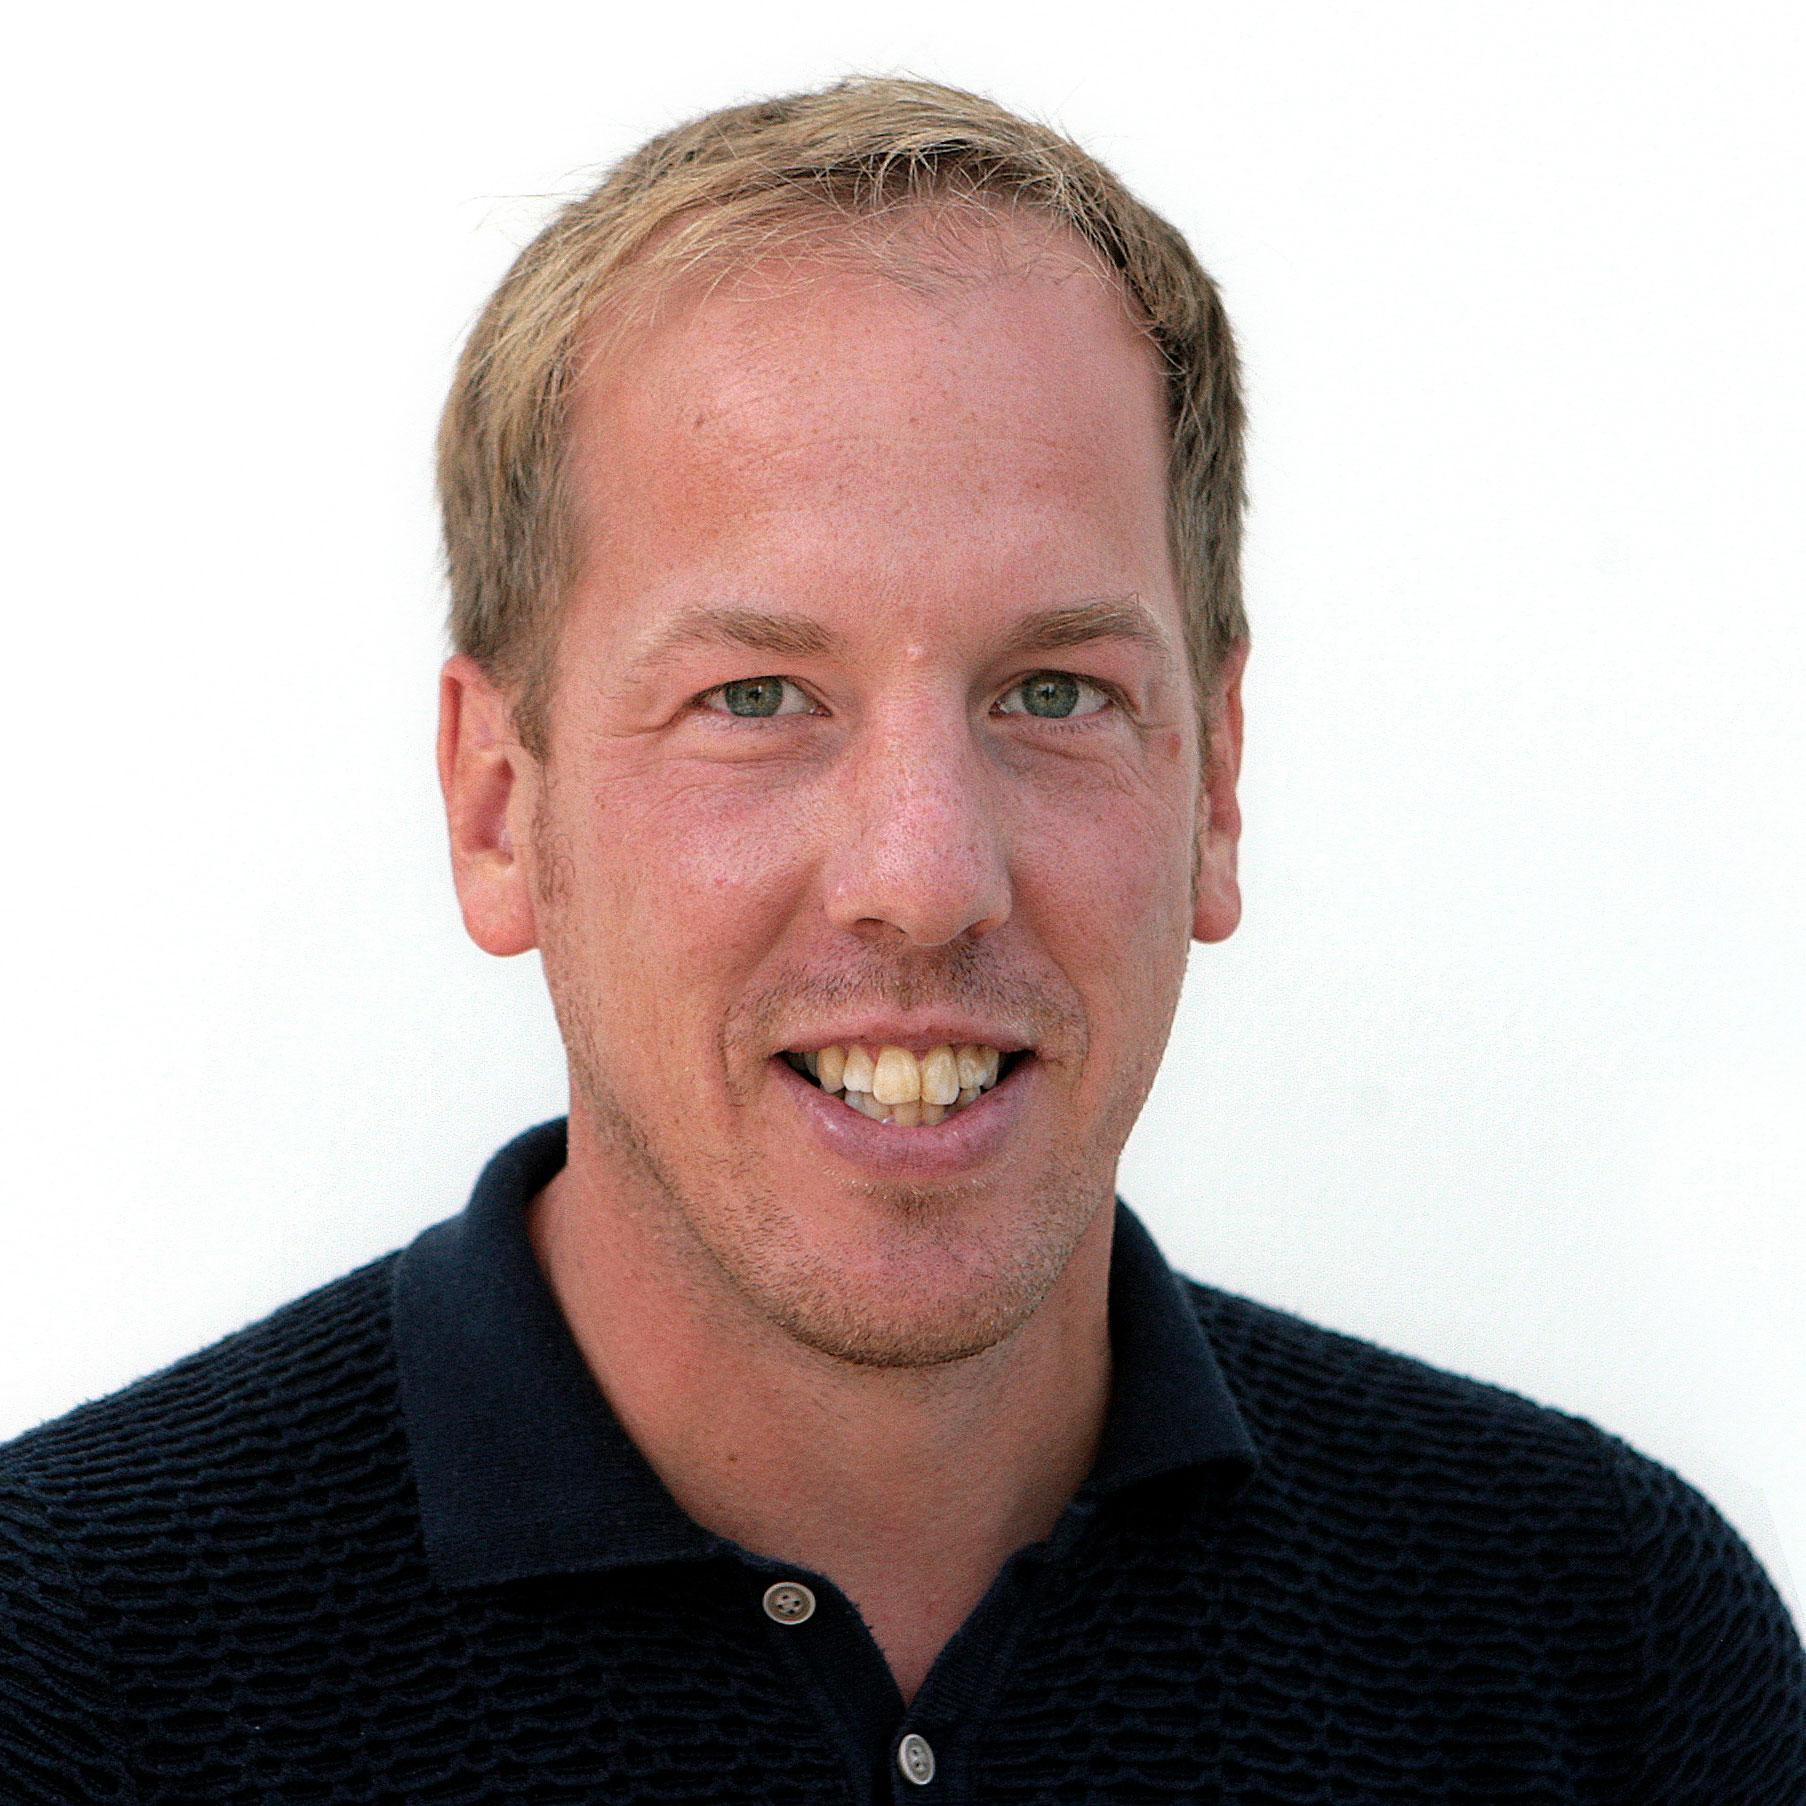 Willem Veldman